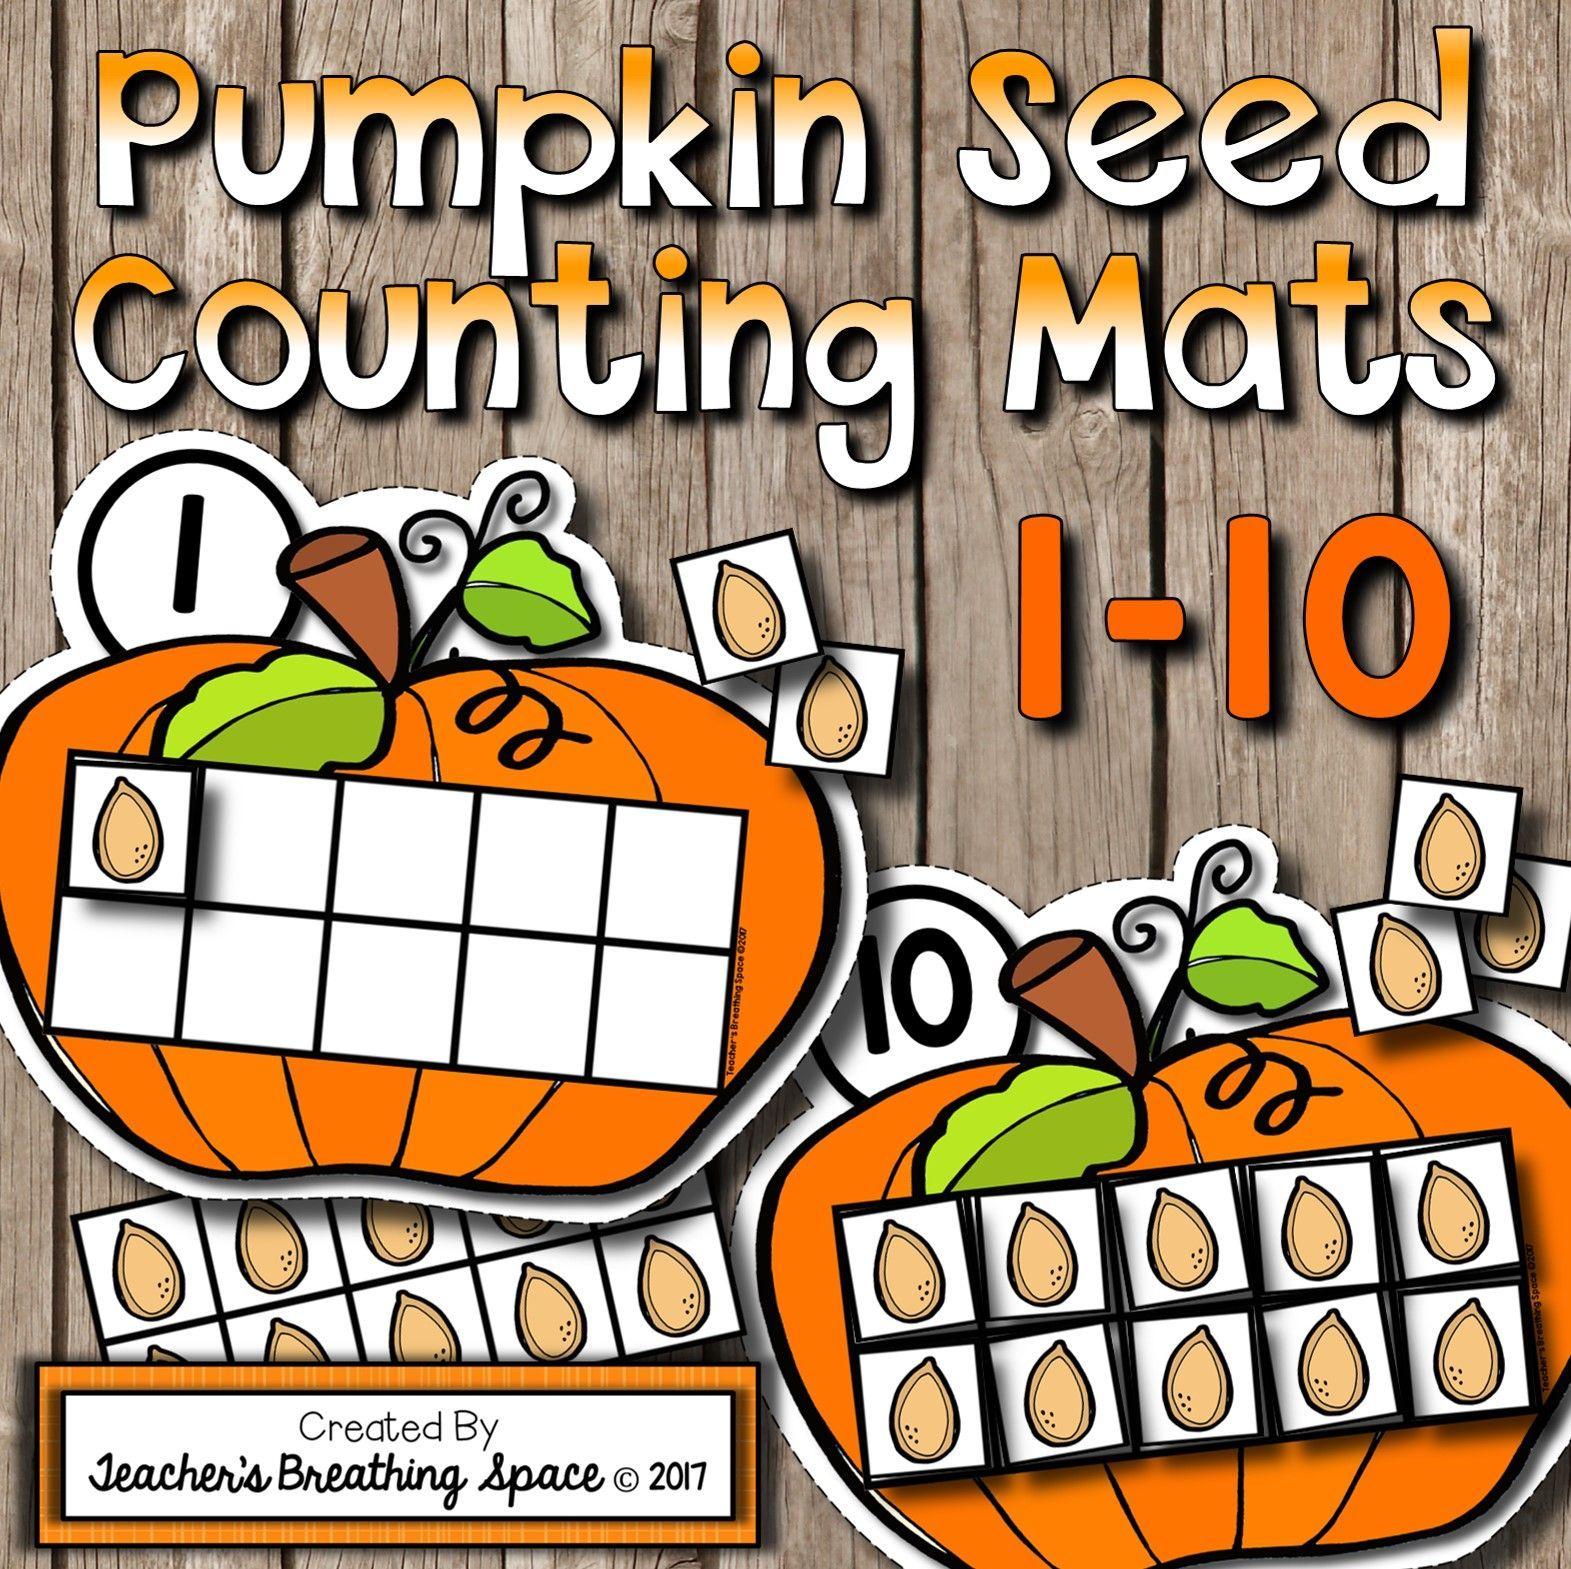 Fall Counting Mats 1 10 Pumpkin Counting Mats With